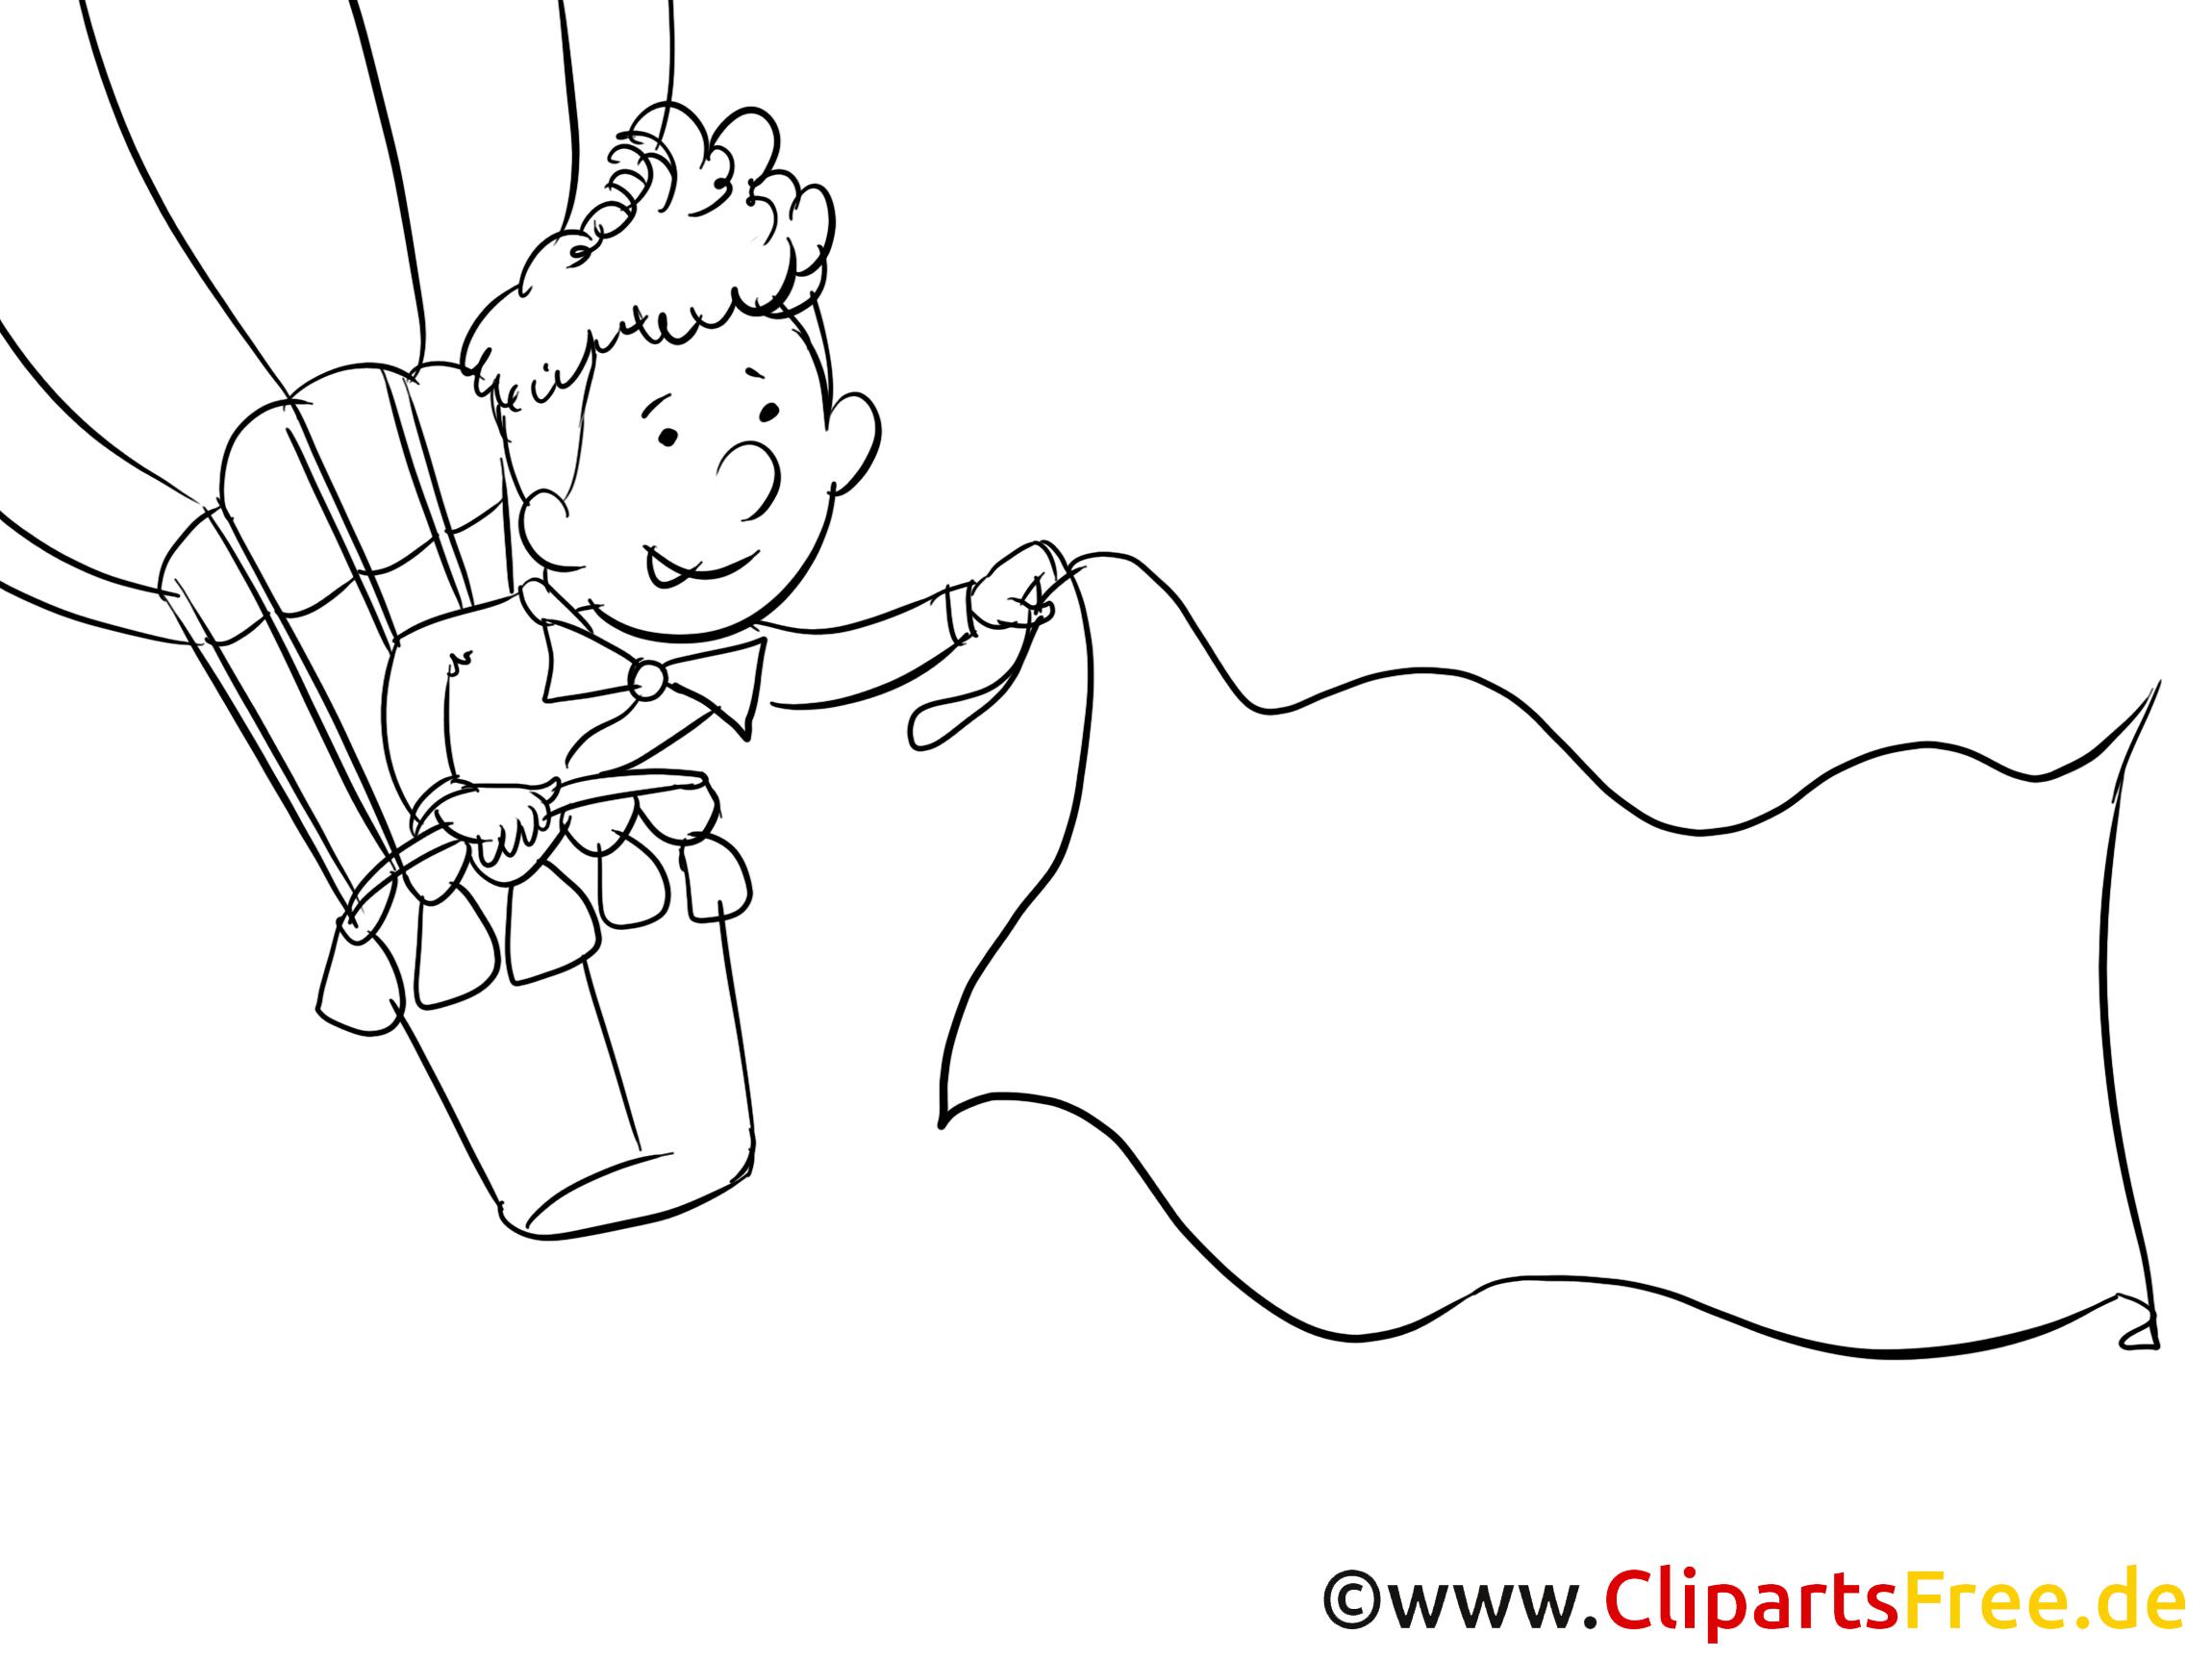 Message Clipart, Cartoon, Image